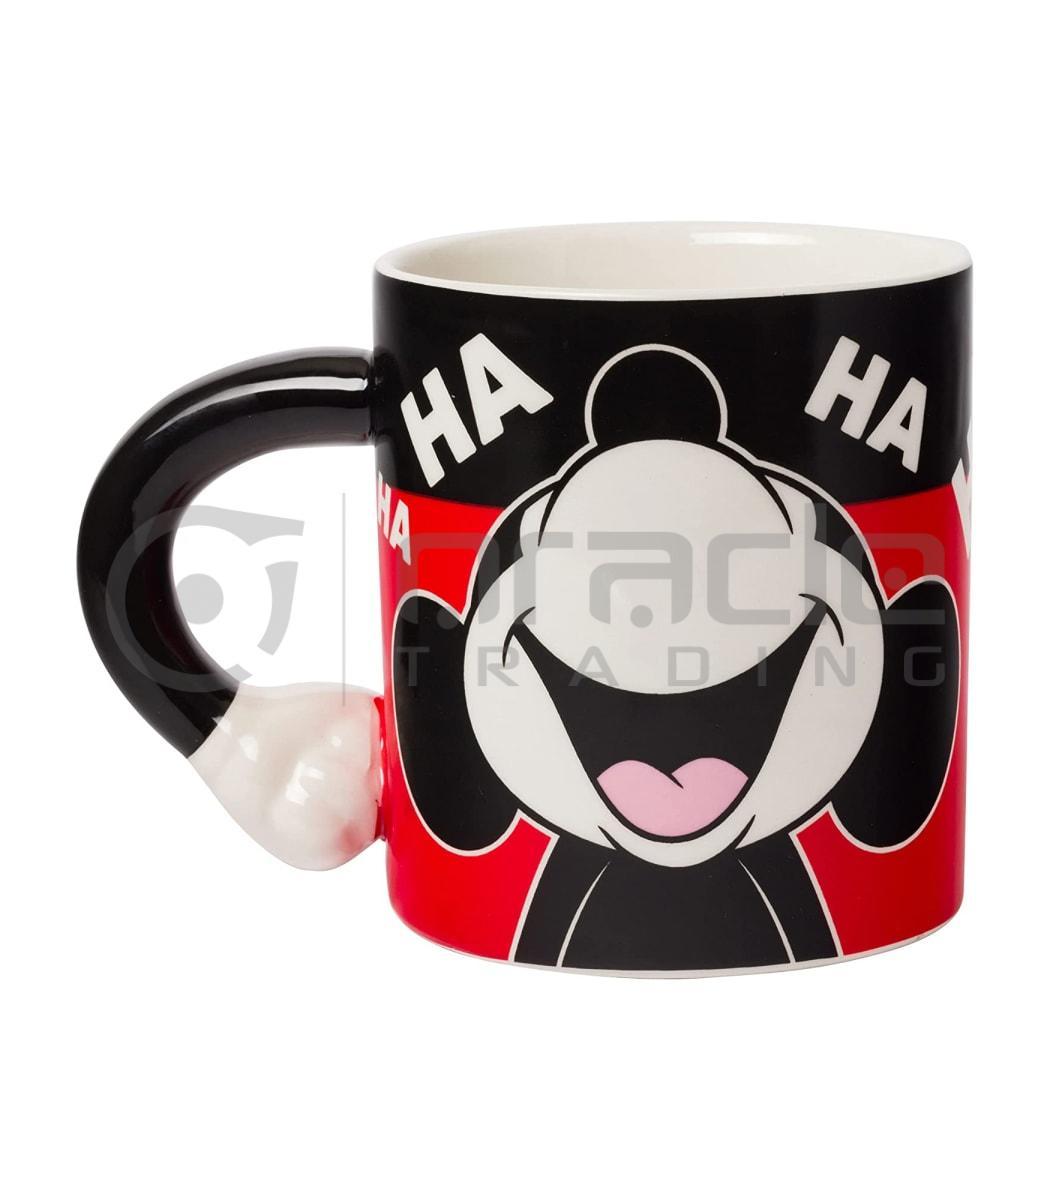 Mickey Mouse Sculpted Mug